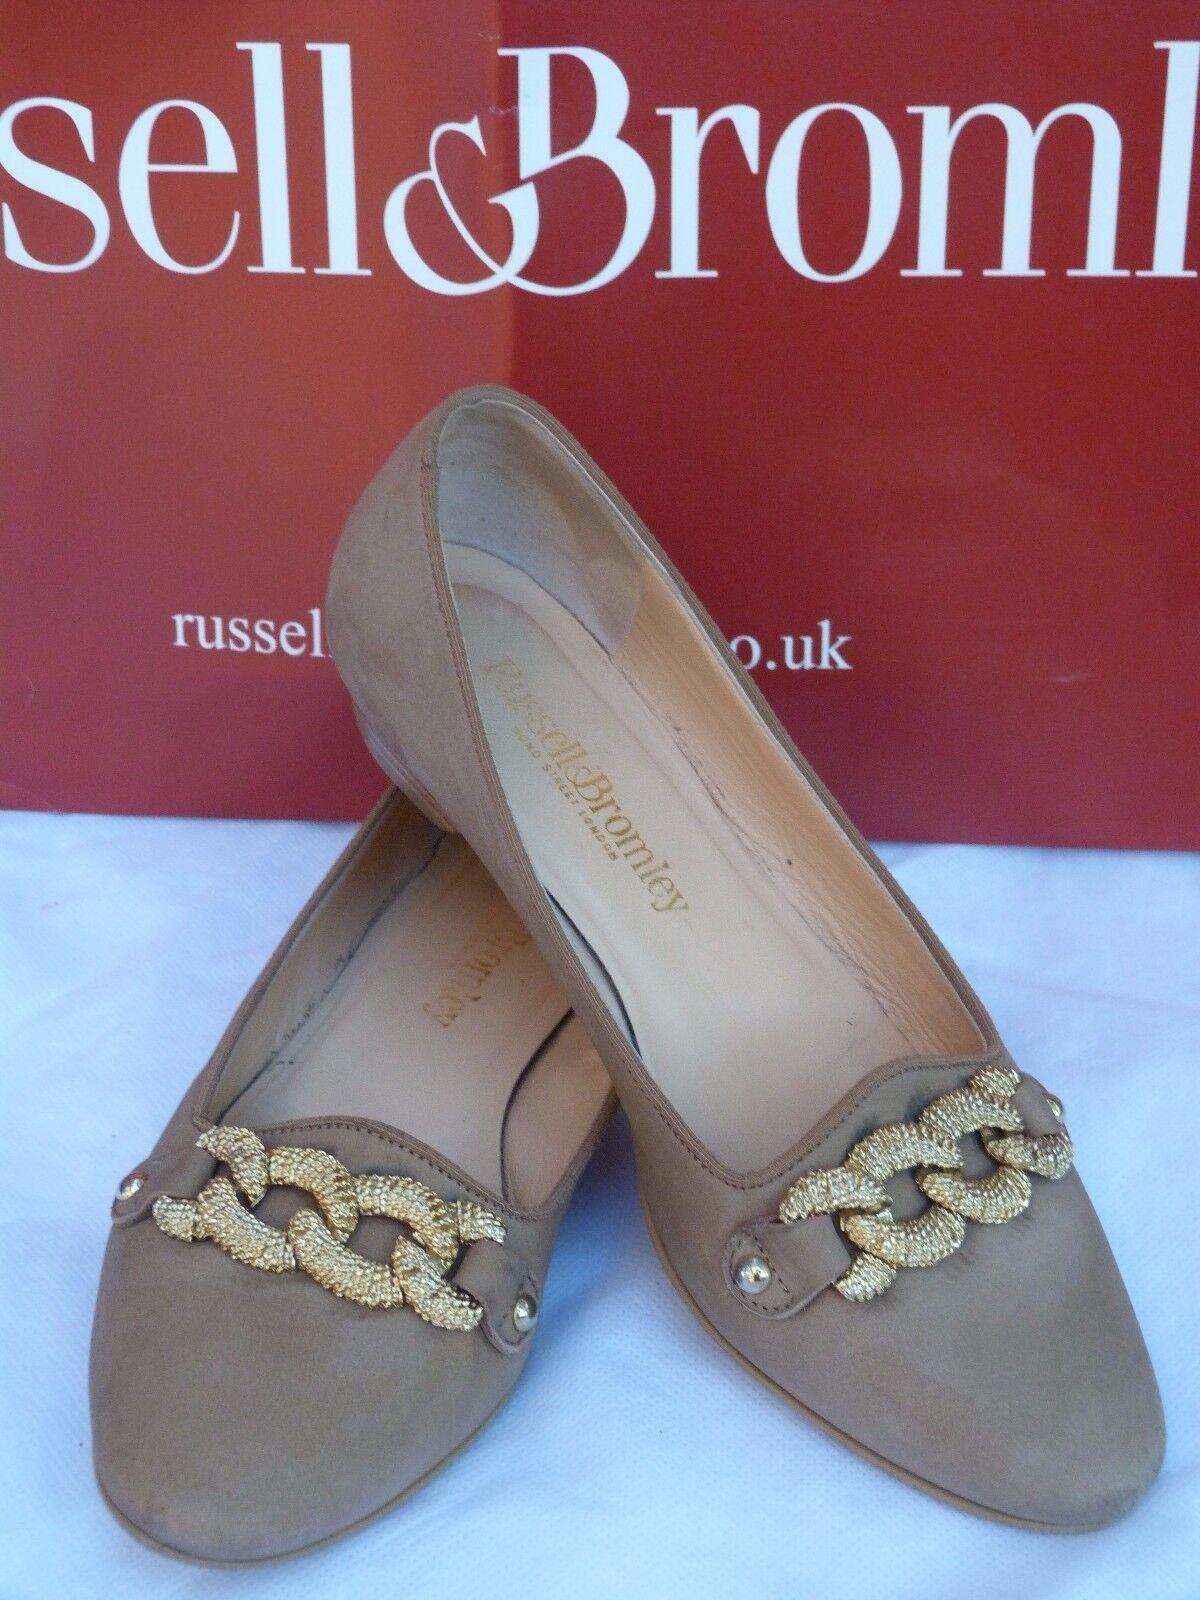 RussellBromley Damens's schuhe Größe 4.5/37.5/taupe/chain/sapatos//женская обув